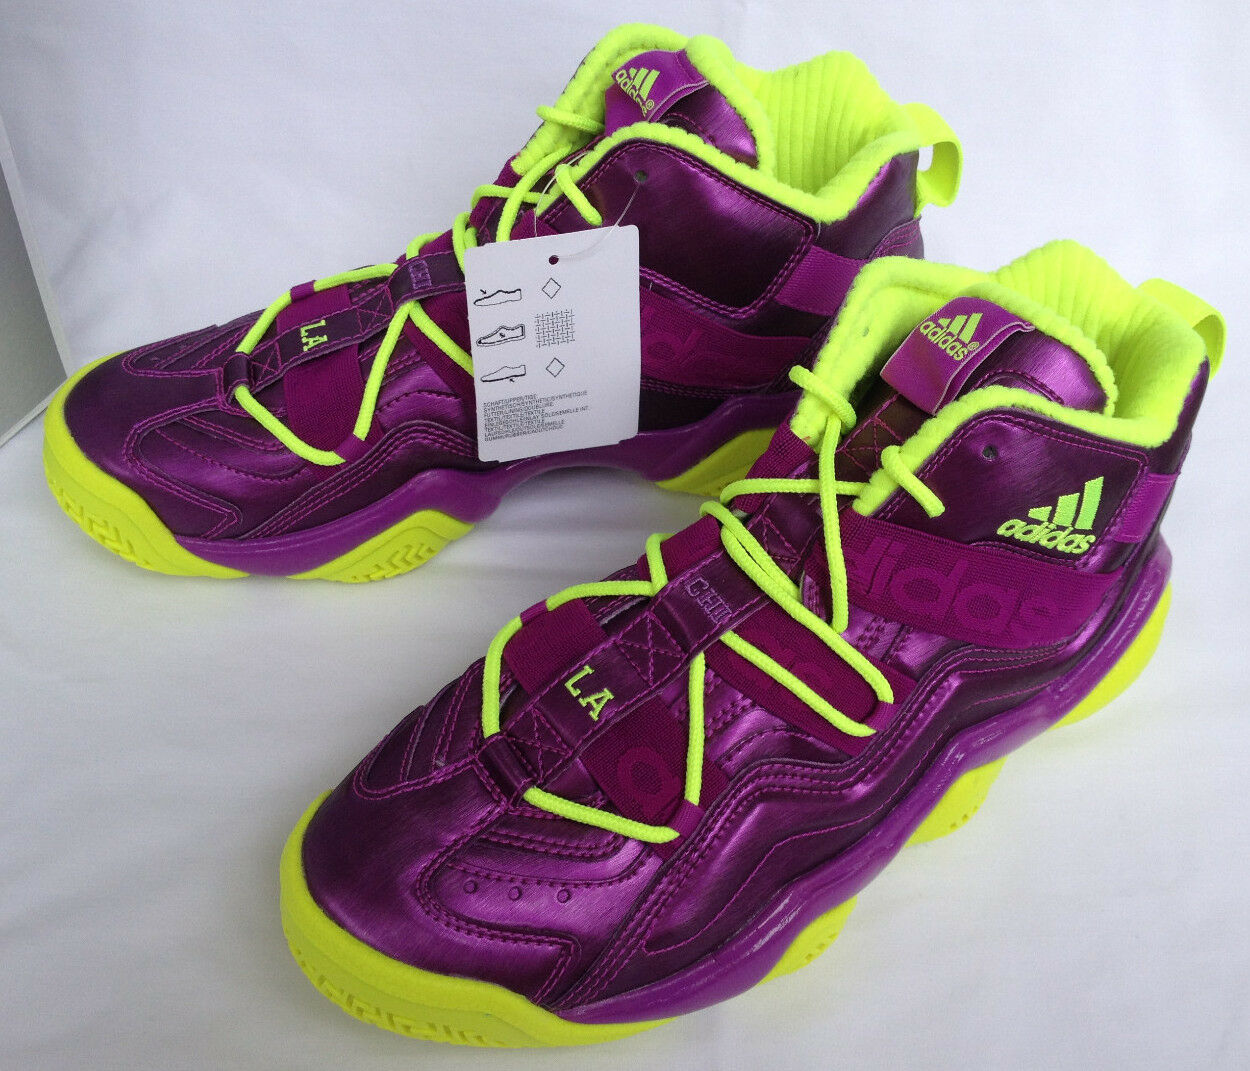 Adidas Top Ten 2018 CHI NYC LA Lakers G59159 Basketball Shoes Men's 10.5 new